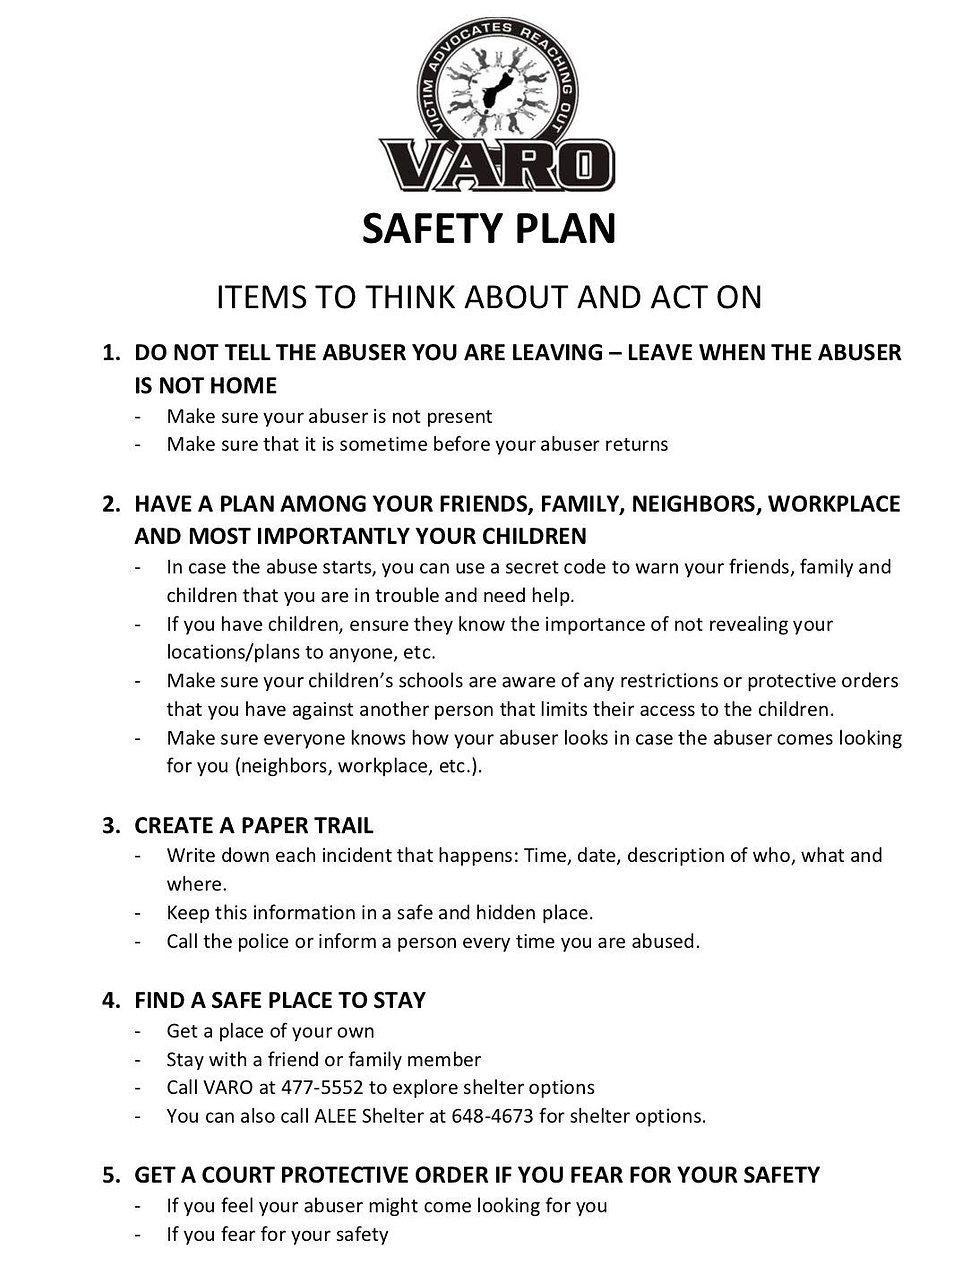 1. Safety Plan.jpg